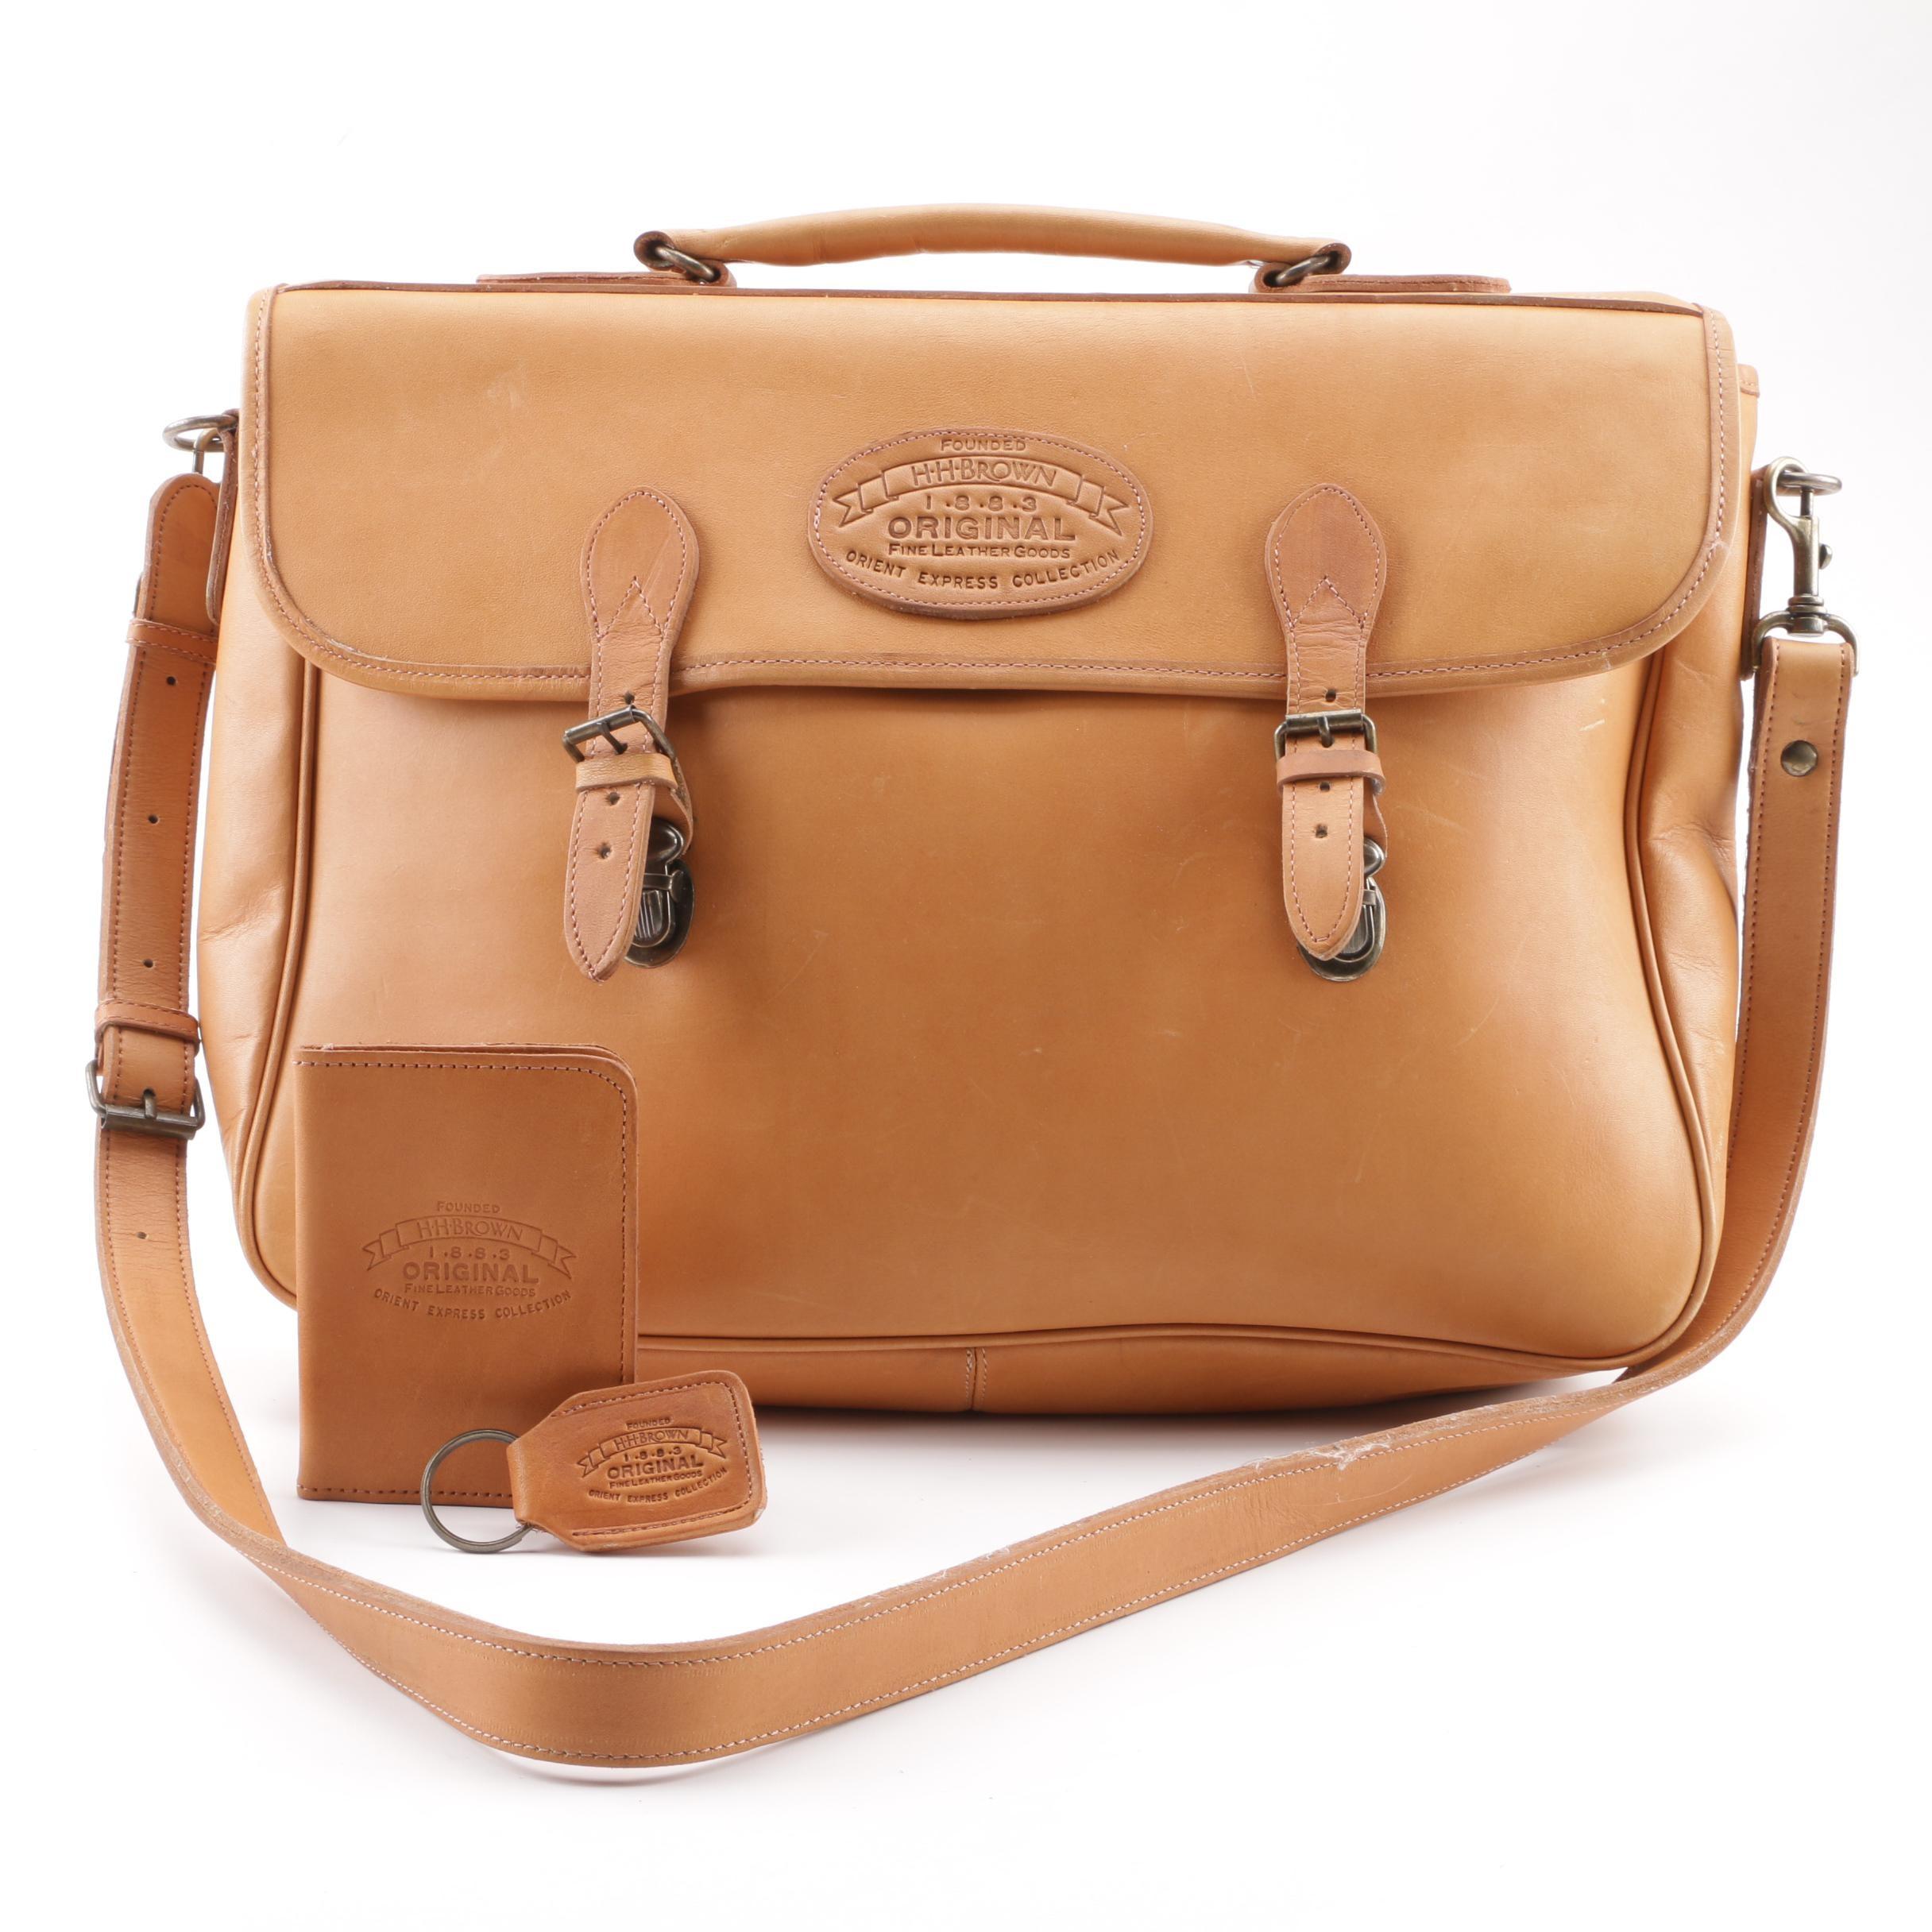 Vintage H.H.Brown Original Fine Leather Goods Messenger Bag, ID Case, Key Chain